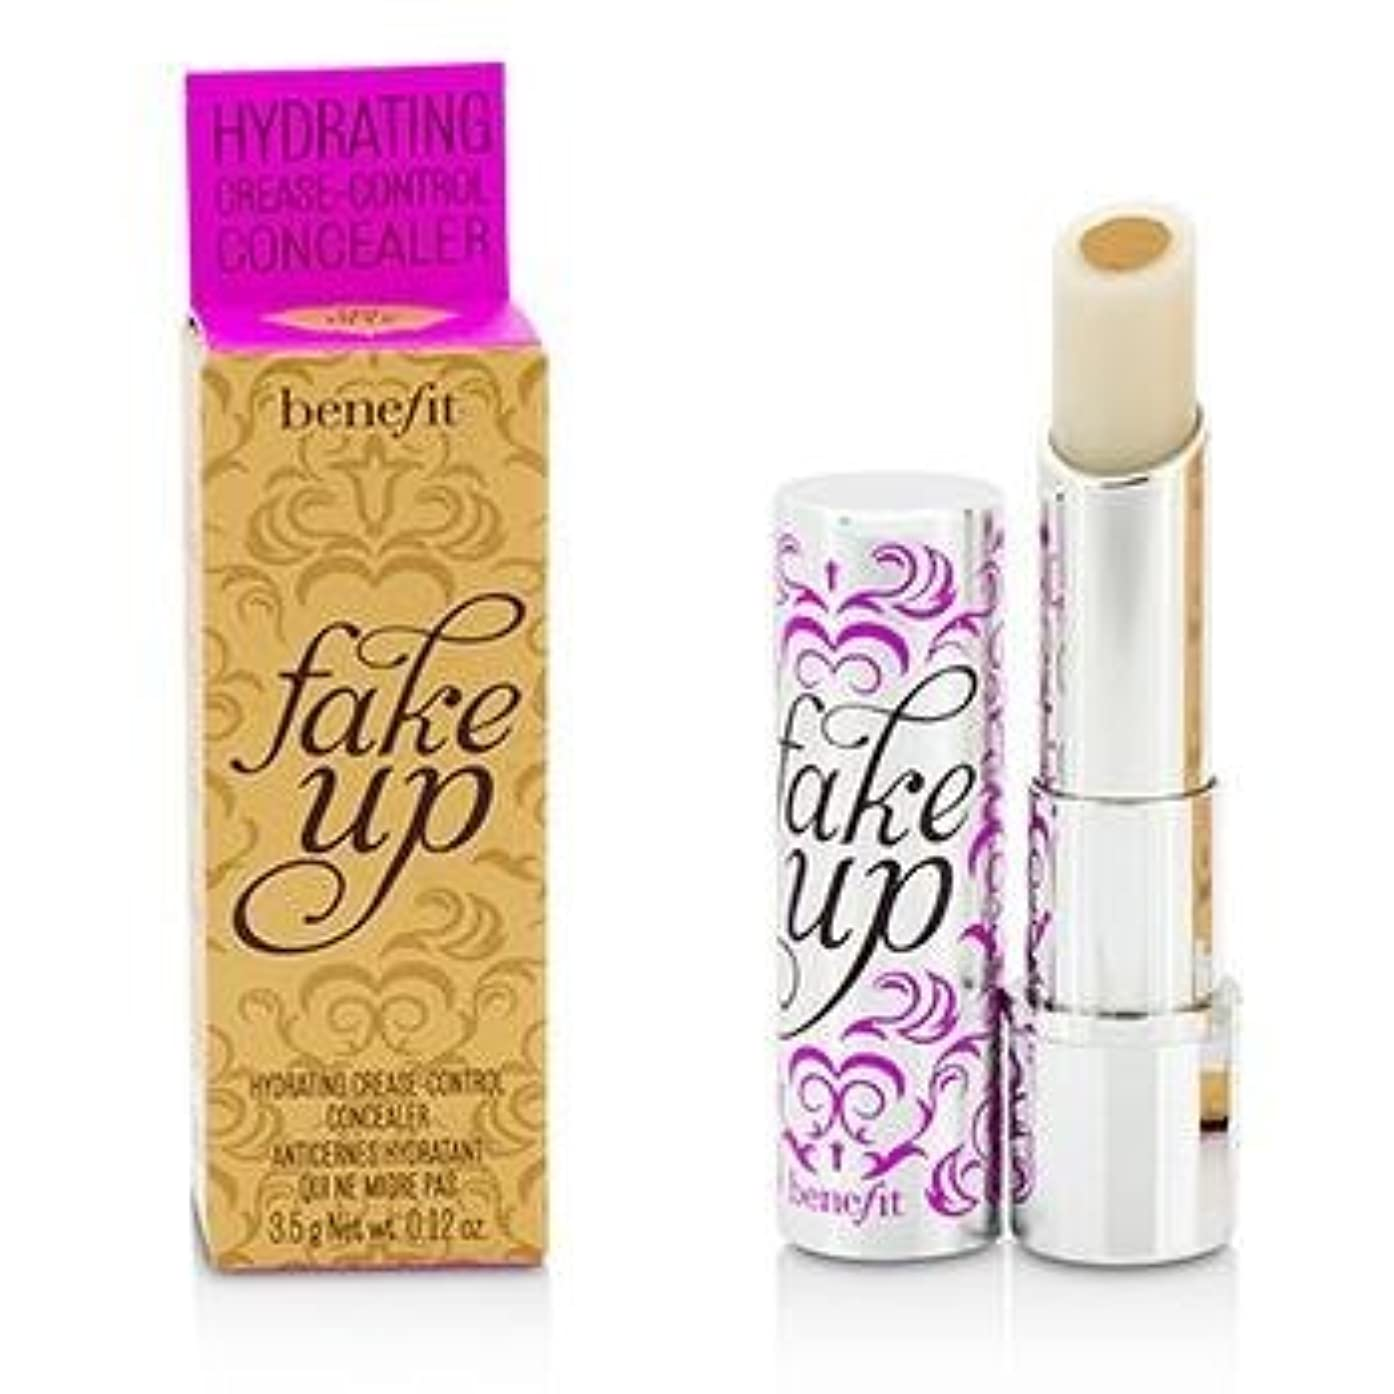 Benefit Cosmetics Fake Up - 03 Deep